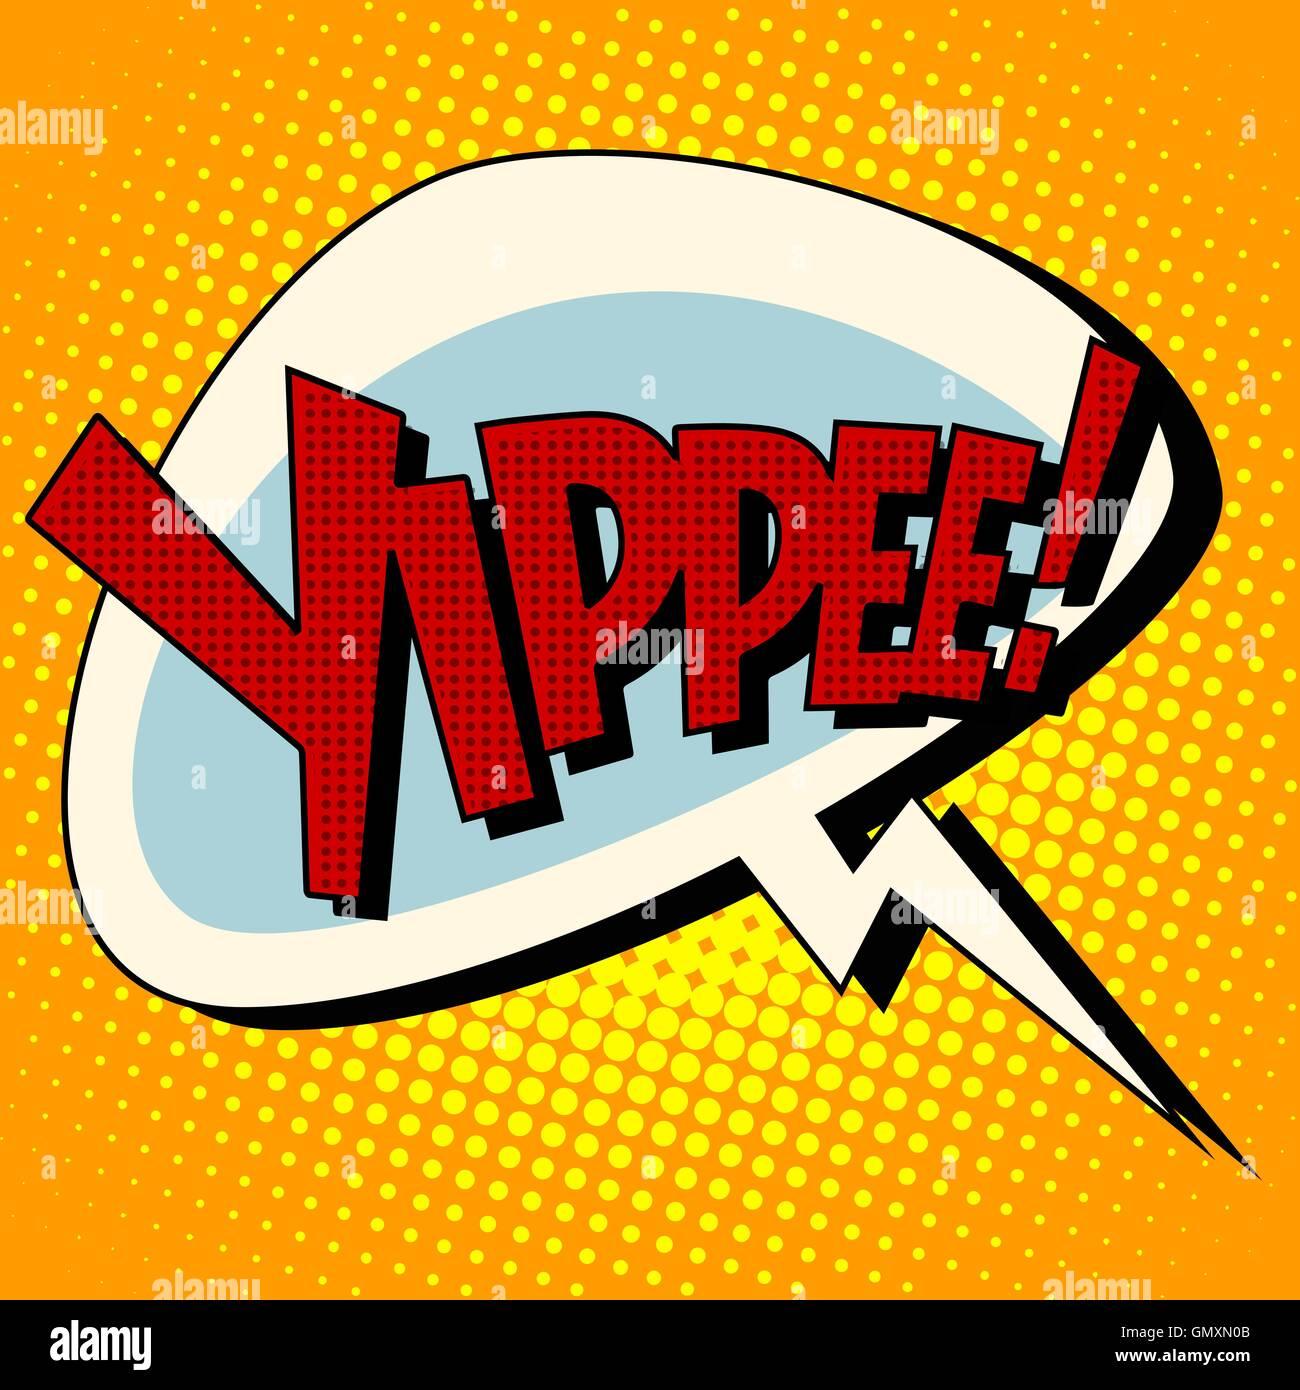 yippee win comic book bubble text - Stock Vector